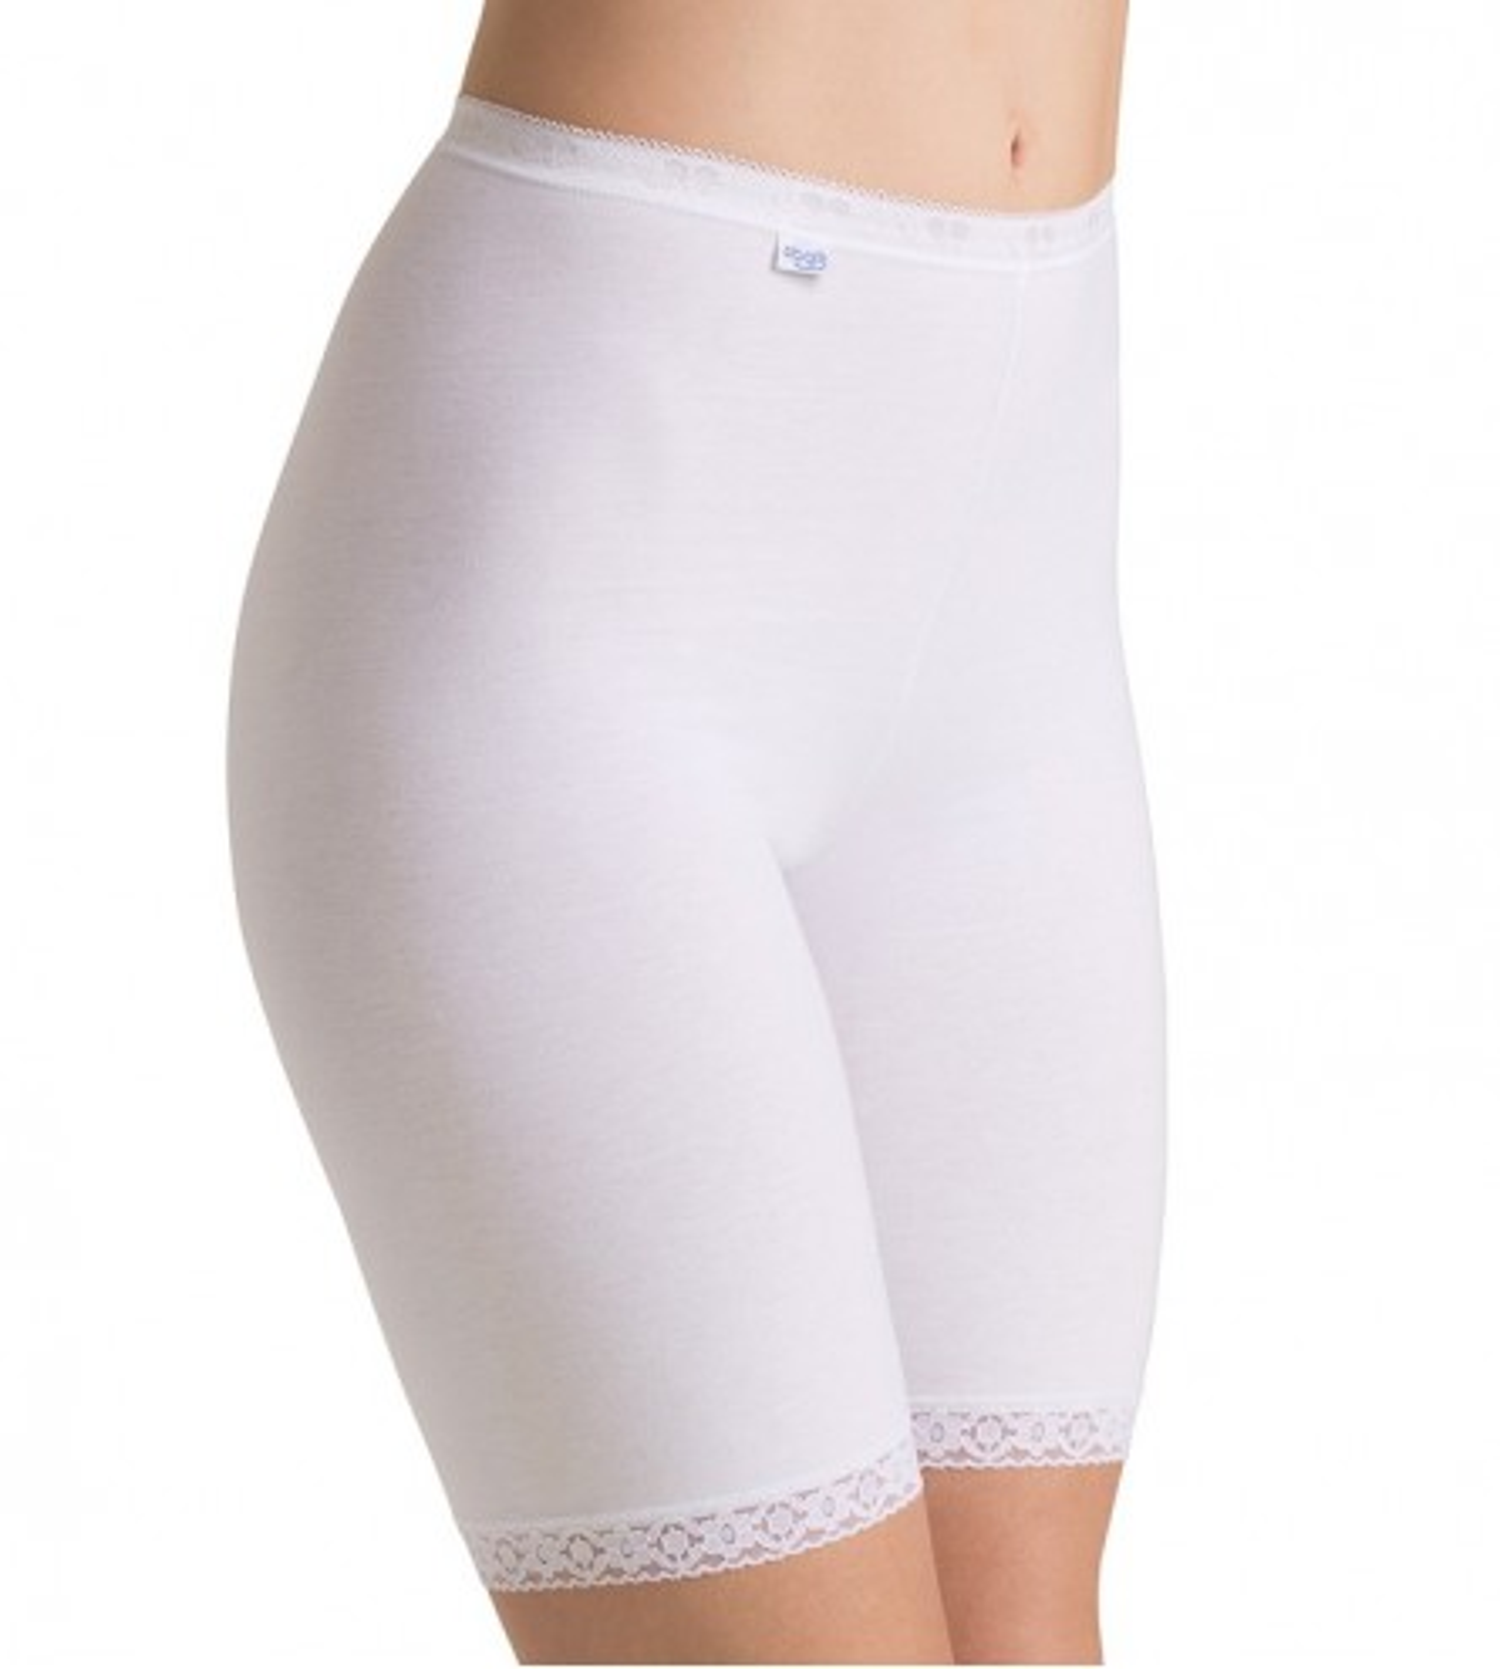 Panty Sloggi Basic + pour femme BLANC